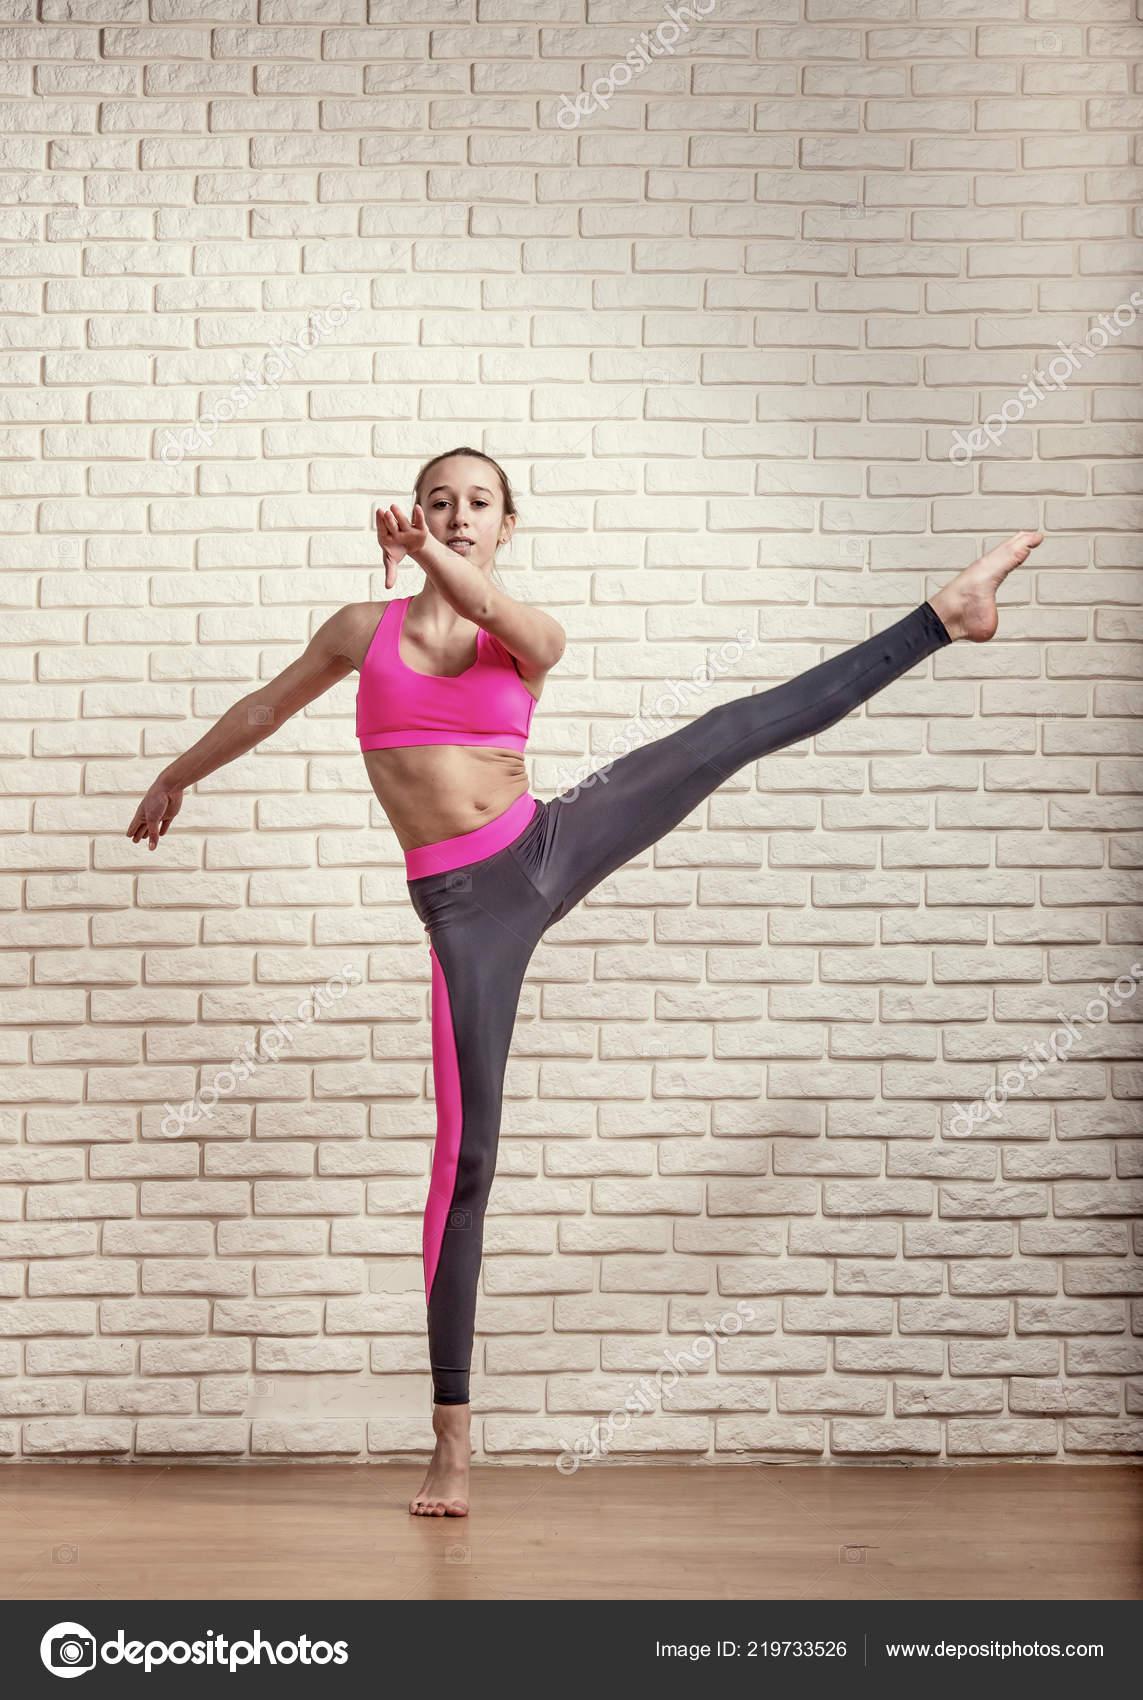 4fcab193e1f Αθλητικό Κορίτσι Έφηβος Acrobat Εκτελεί Πόδια Υψηλή Ταλάντευση– εικόνα  αρχείου